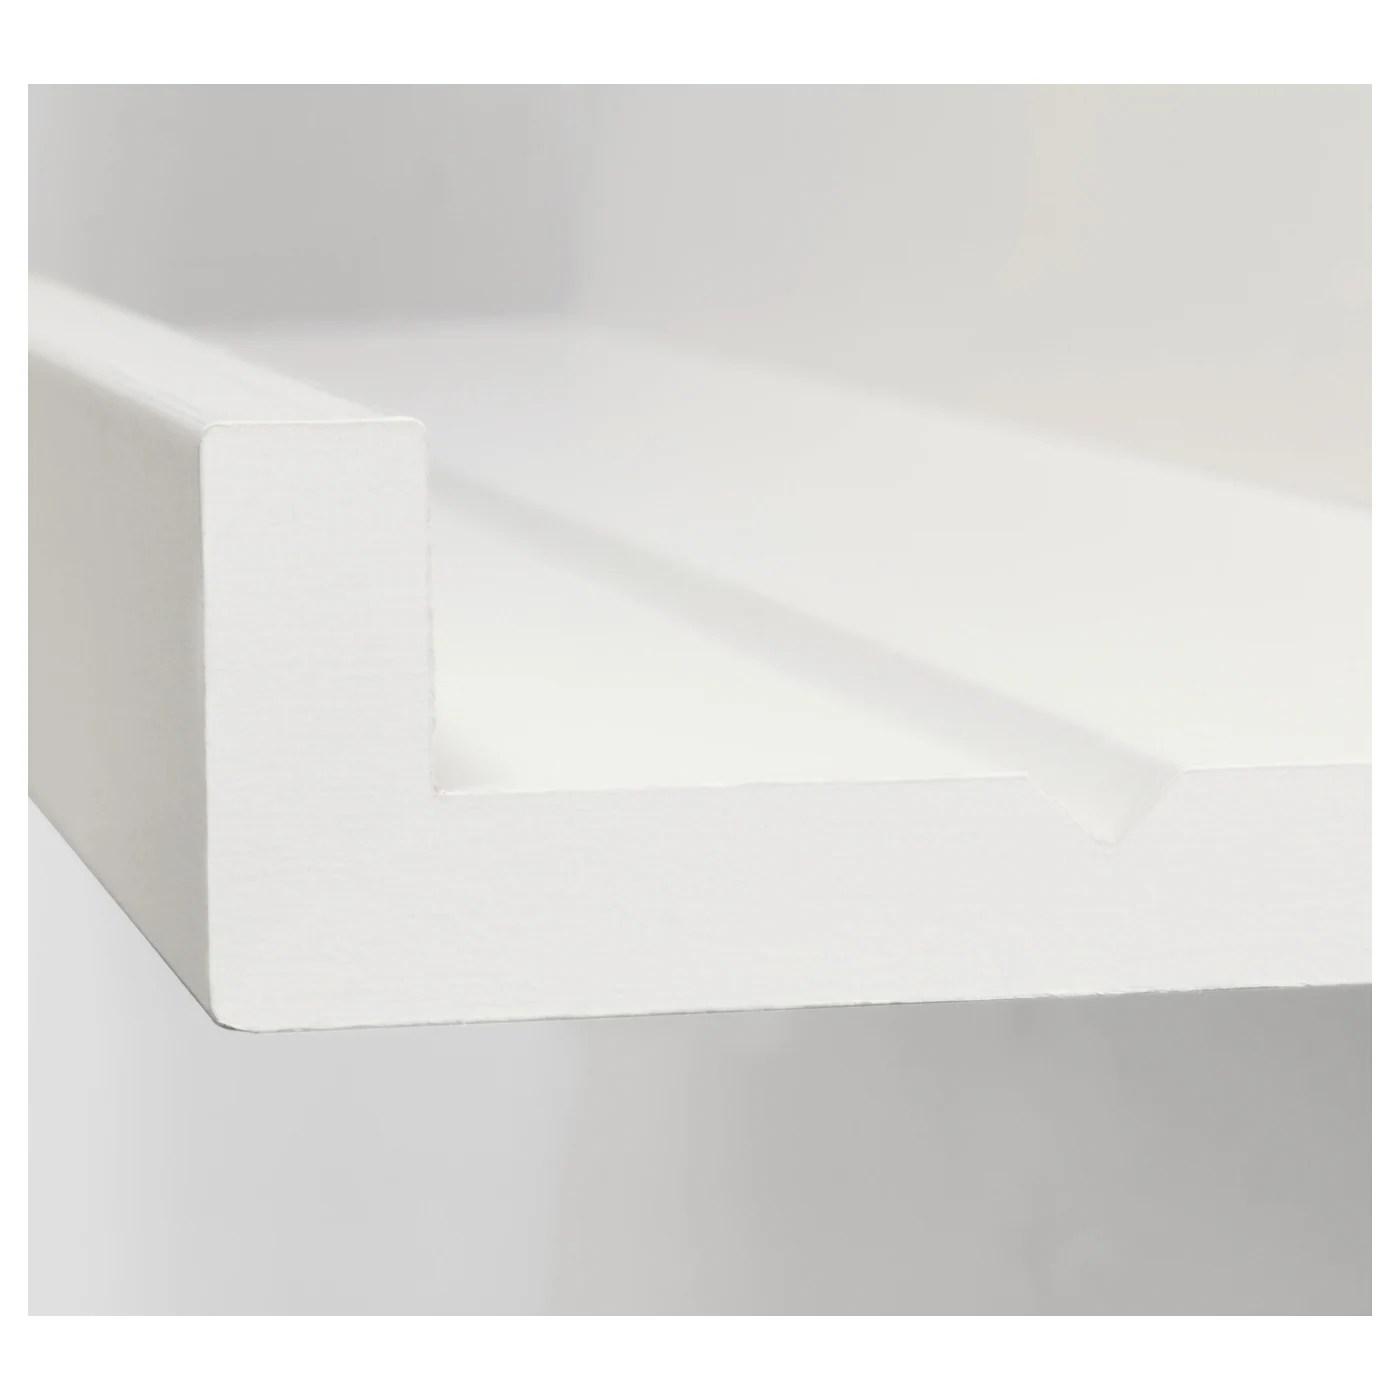 Mosslanda Cimaise Blanc 451 4 115 Cm Ikea